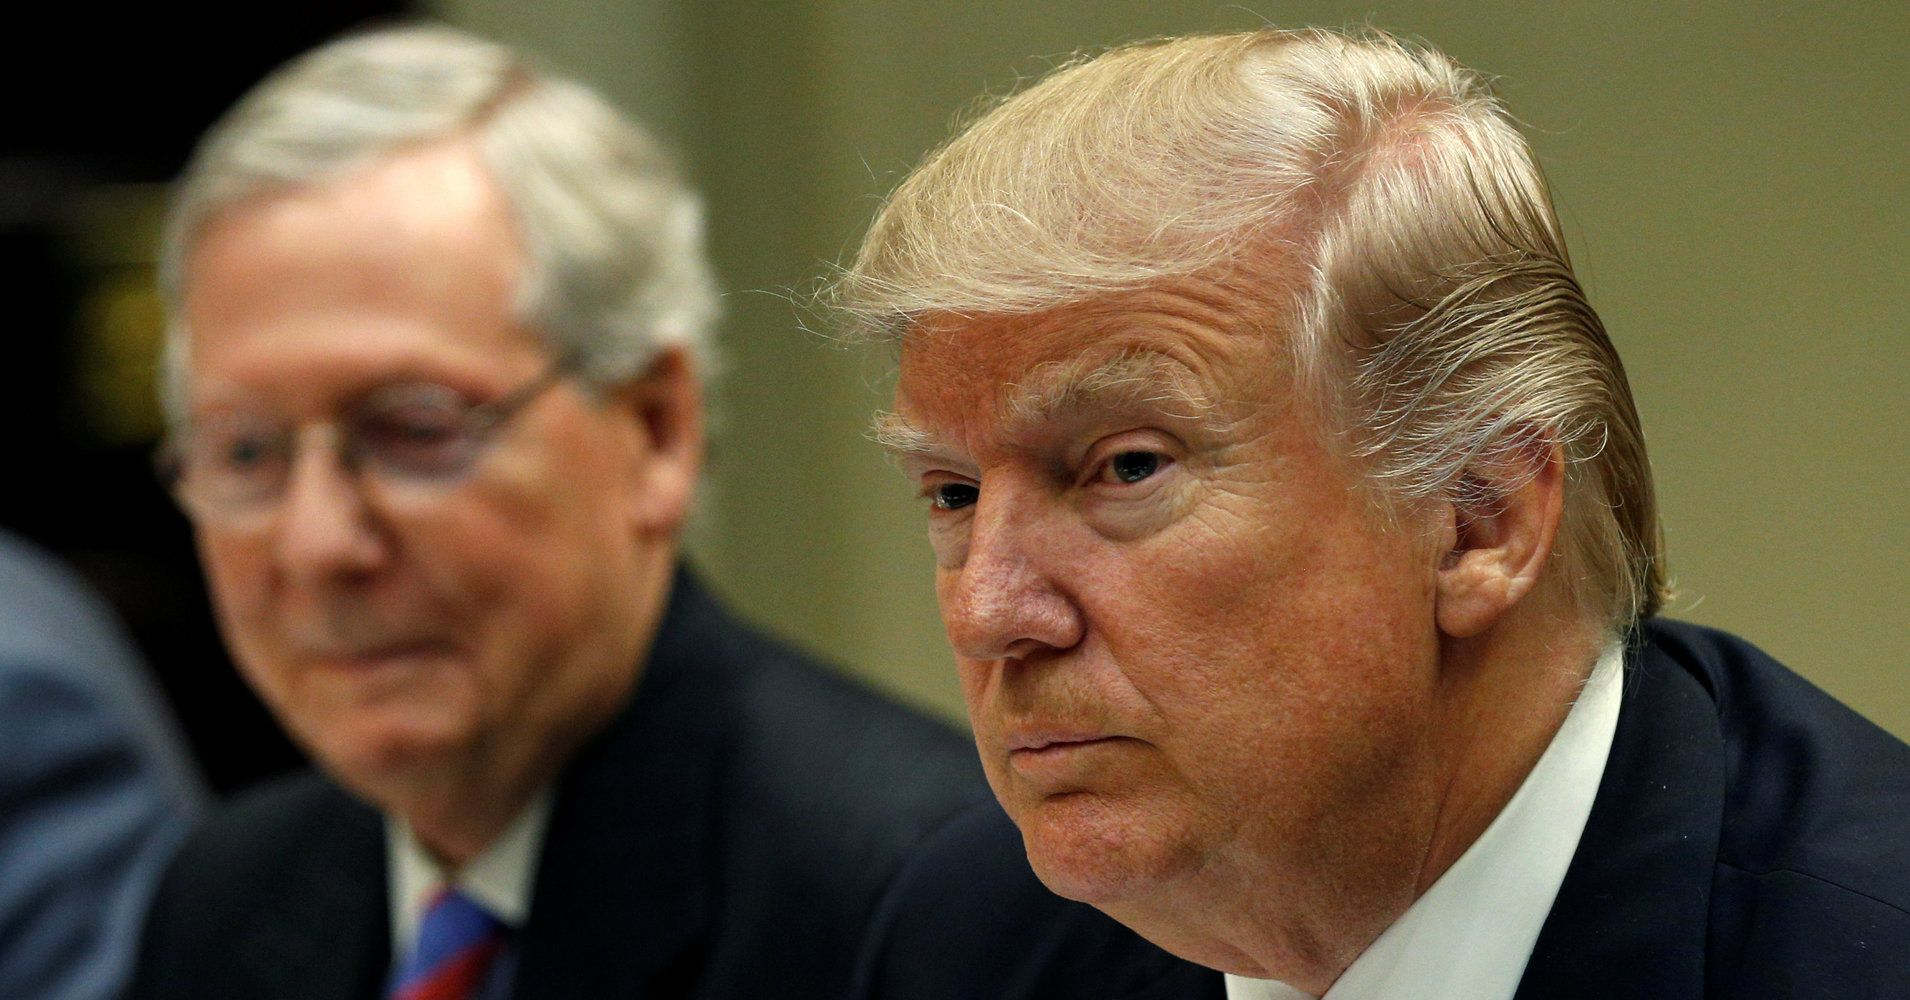 GOP Infighting Explodes Into Open Over Stalled Legislative